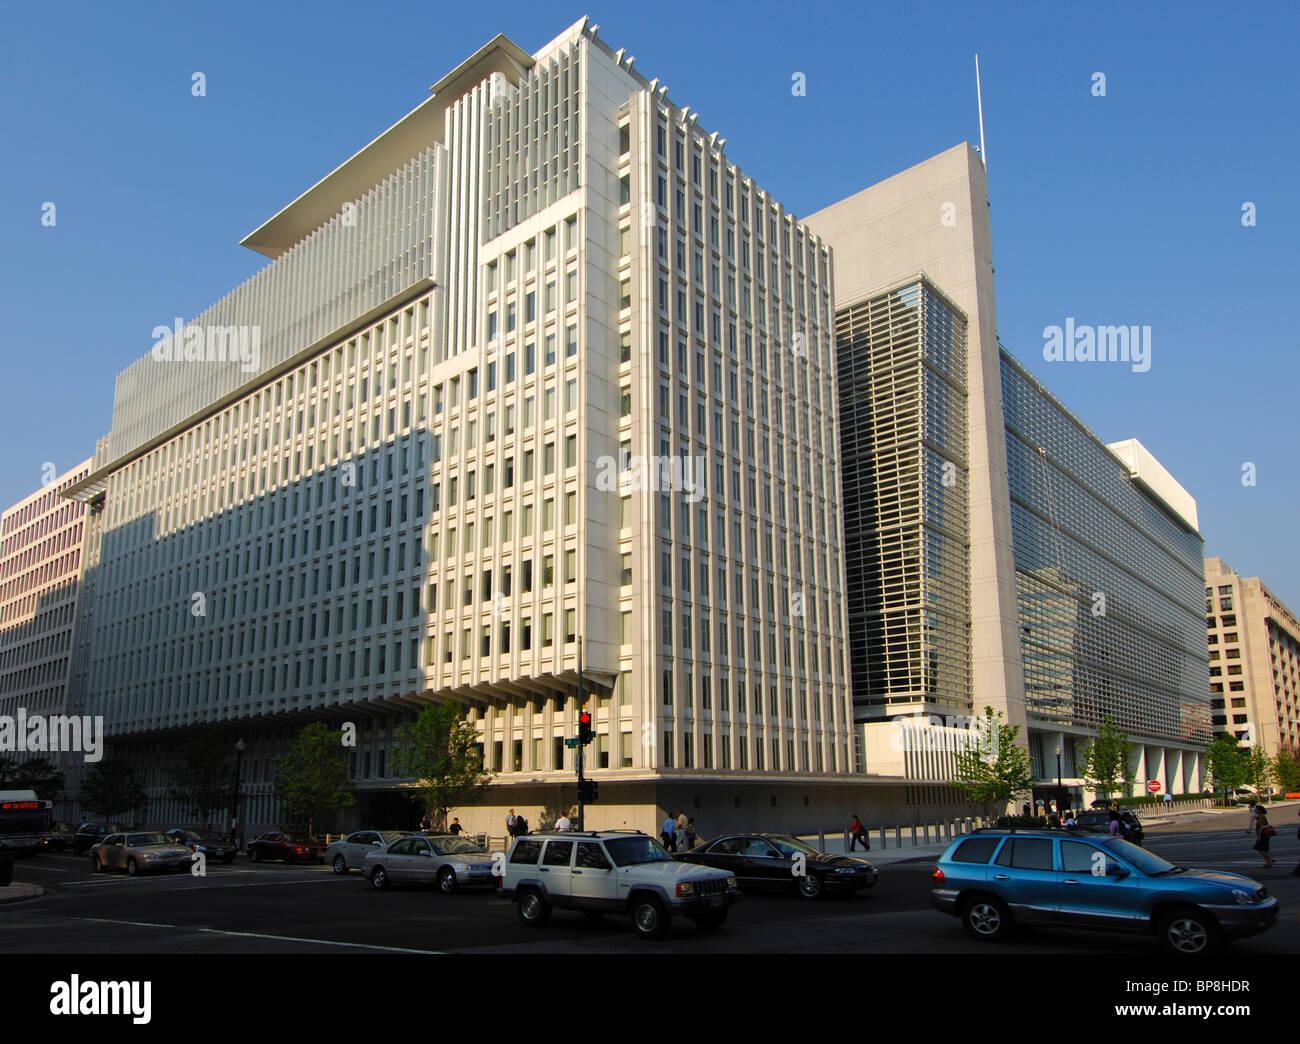 Headquarters of the International Bank for Reconstruction and Development (IBRD), World Bank, Washington, D.C., - Stock Image